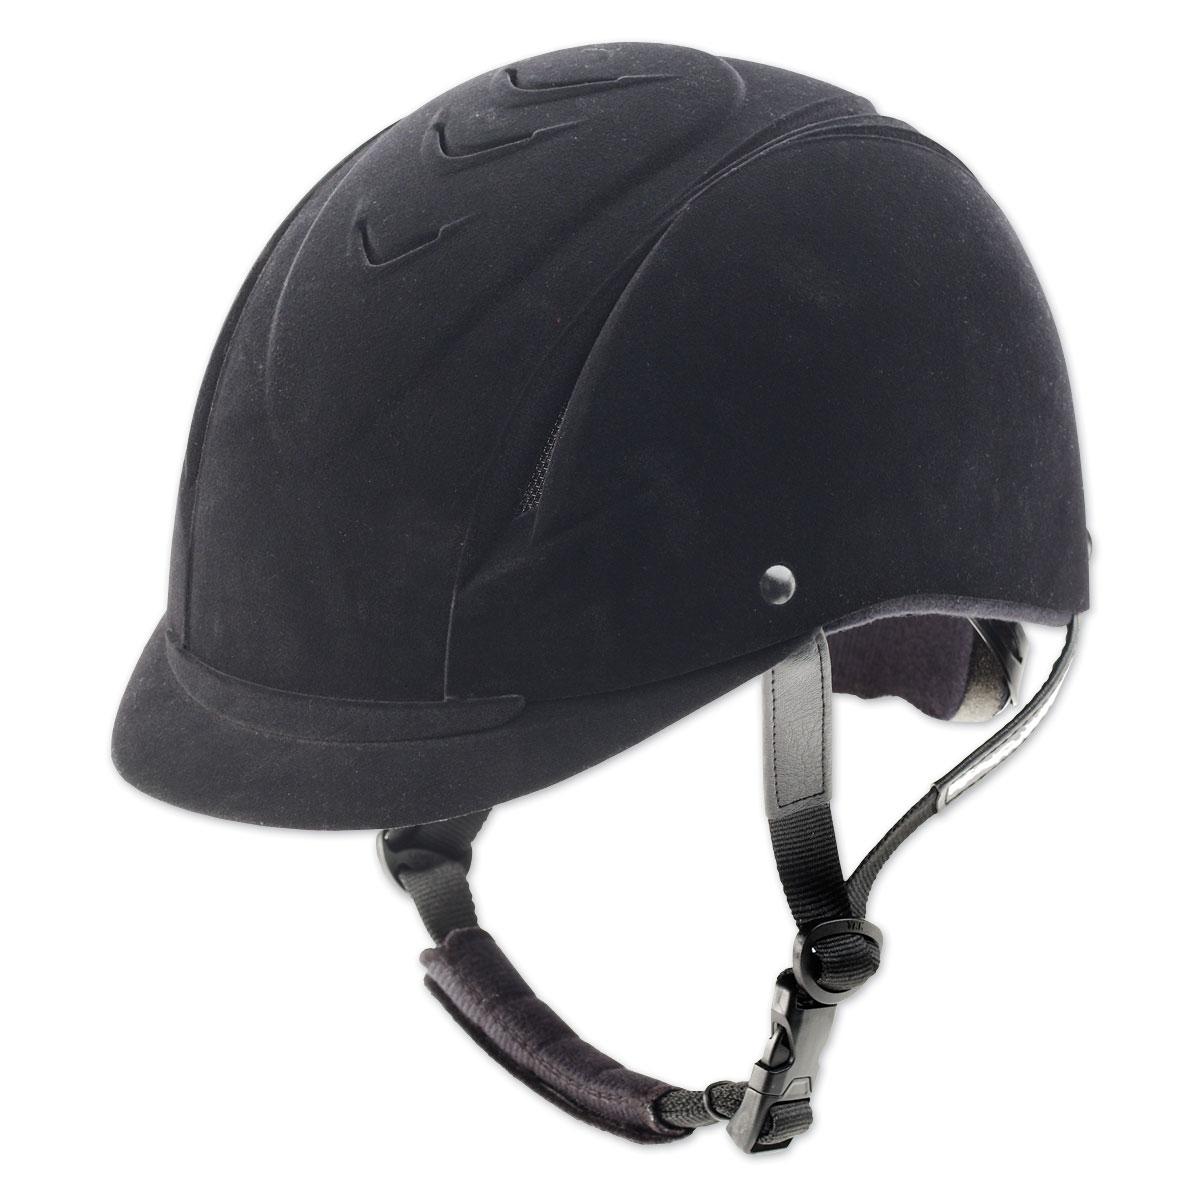 Ovation Competitor Helmet